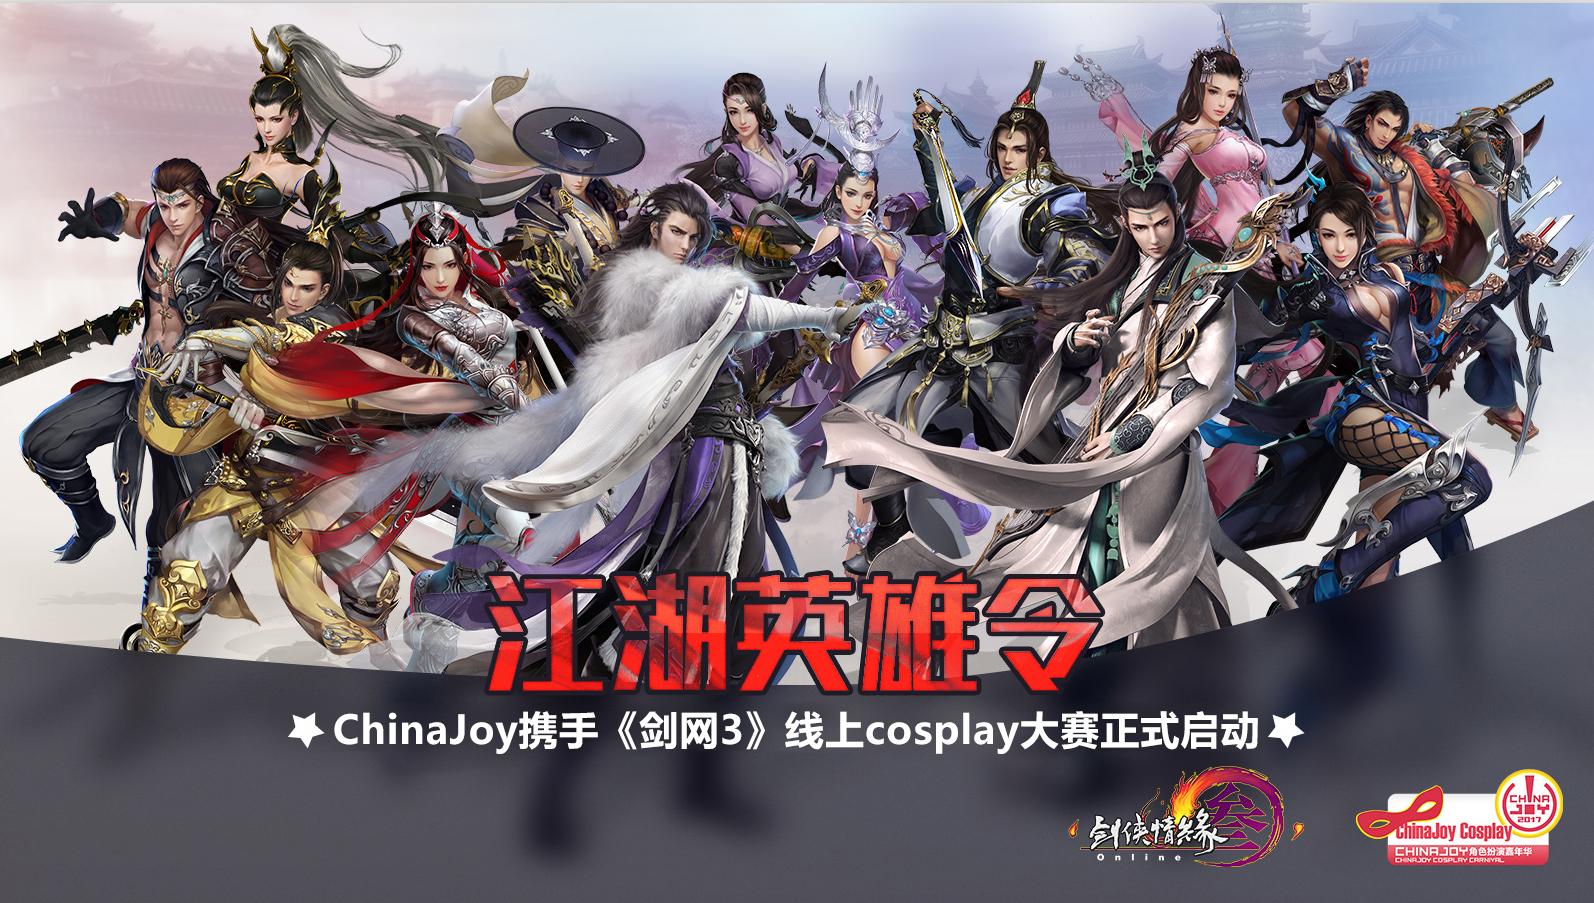 ChinaJoy携手《剑网3》线上cosplay大赛正式启动-ANICOGA